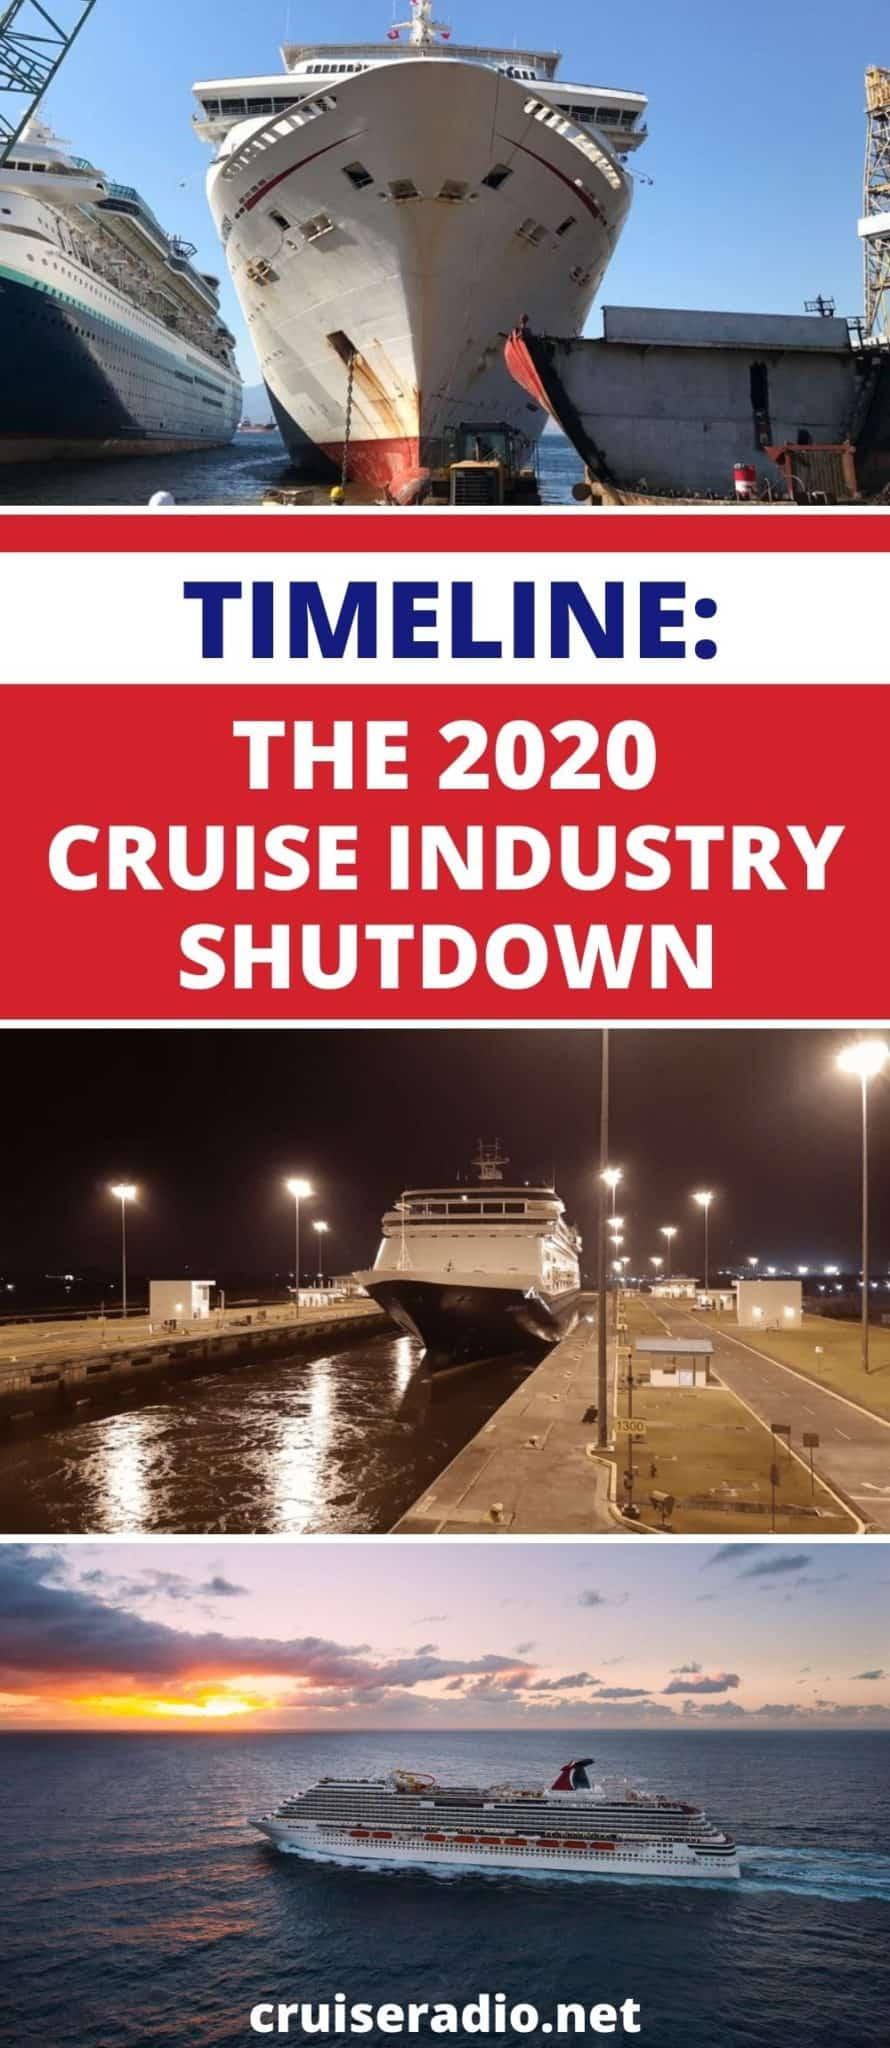 timeline cruise industry shutdown 2020